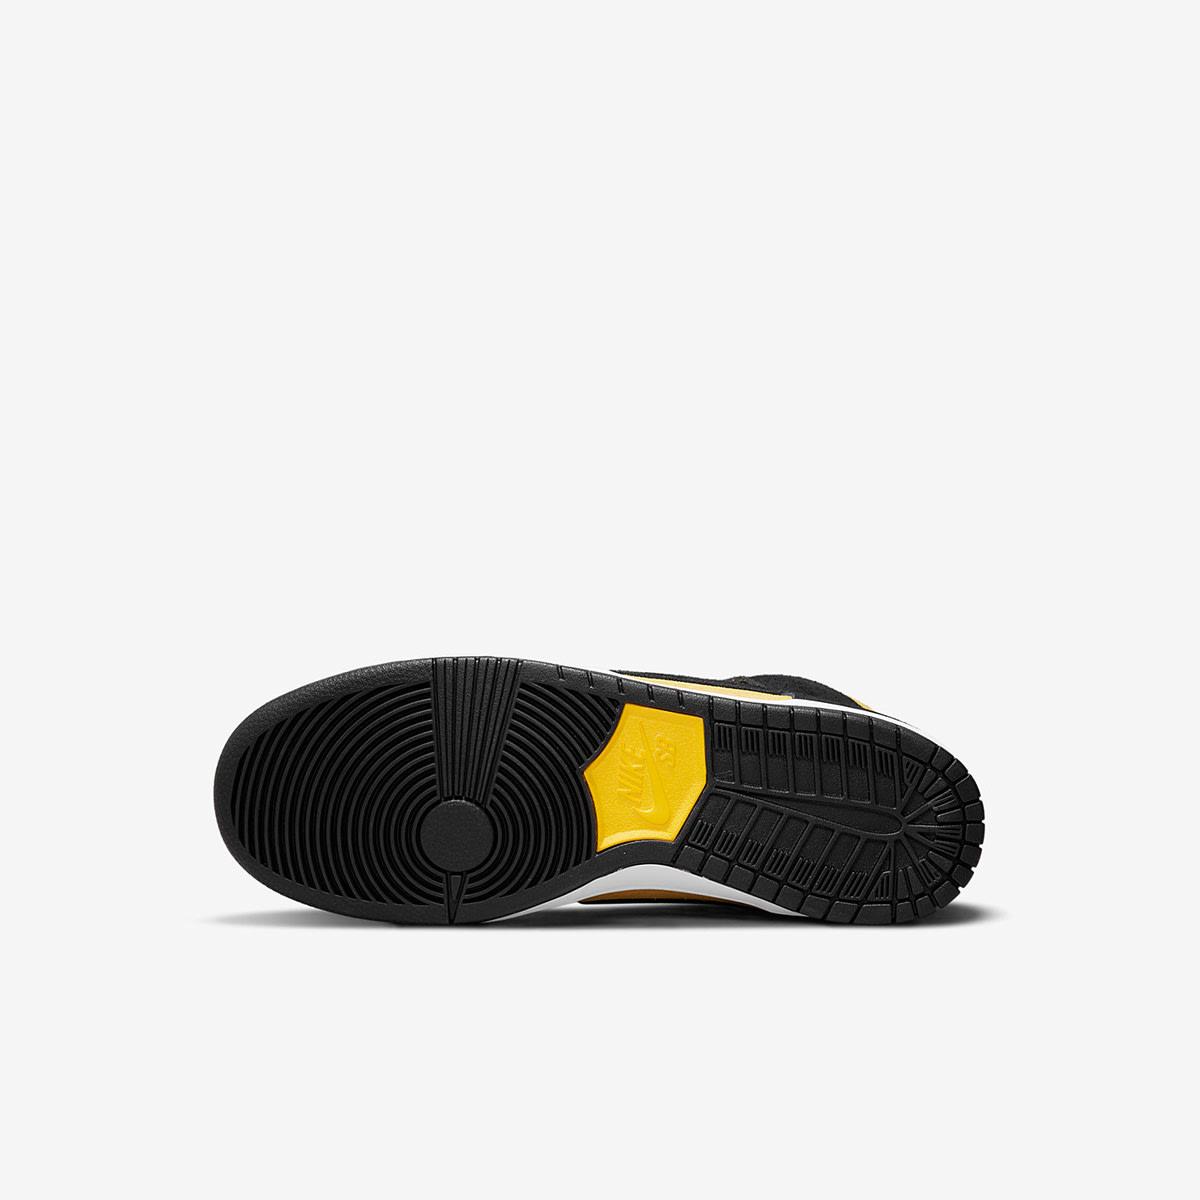 Nike SB Dunk High Pro - DB1640-001